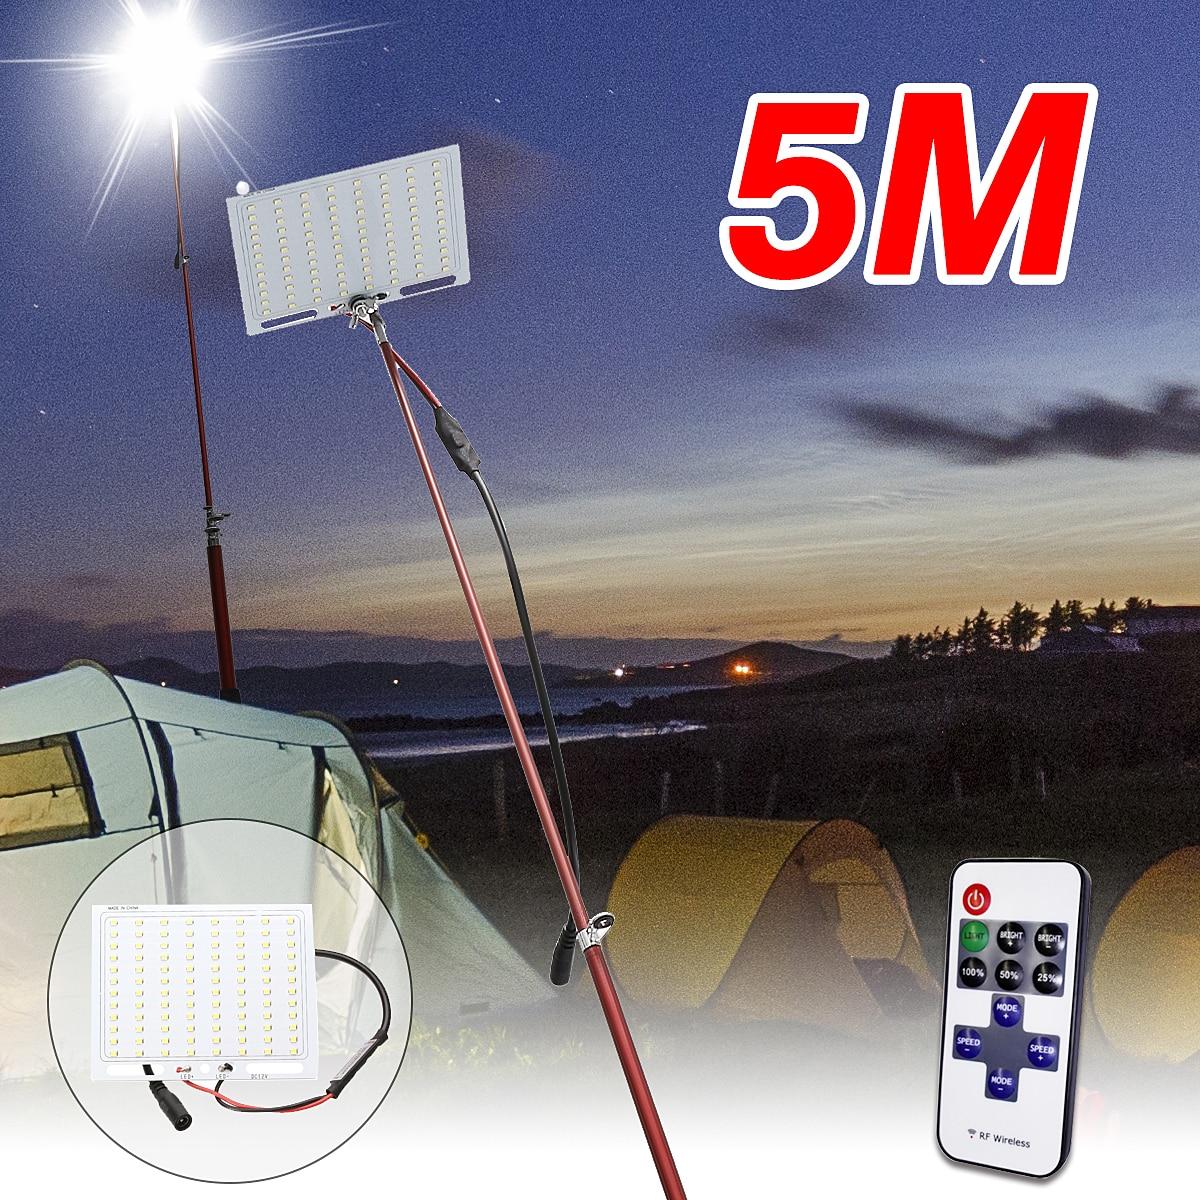 купить 5M Portable Telescopic Fishing Rod Remote Control Car LED Lantern Outdoor Camping Night Fishing Lamp Light по цене 2196.32 рублей